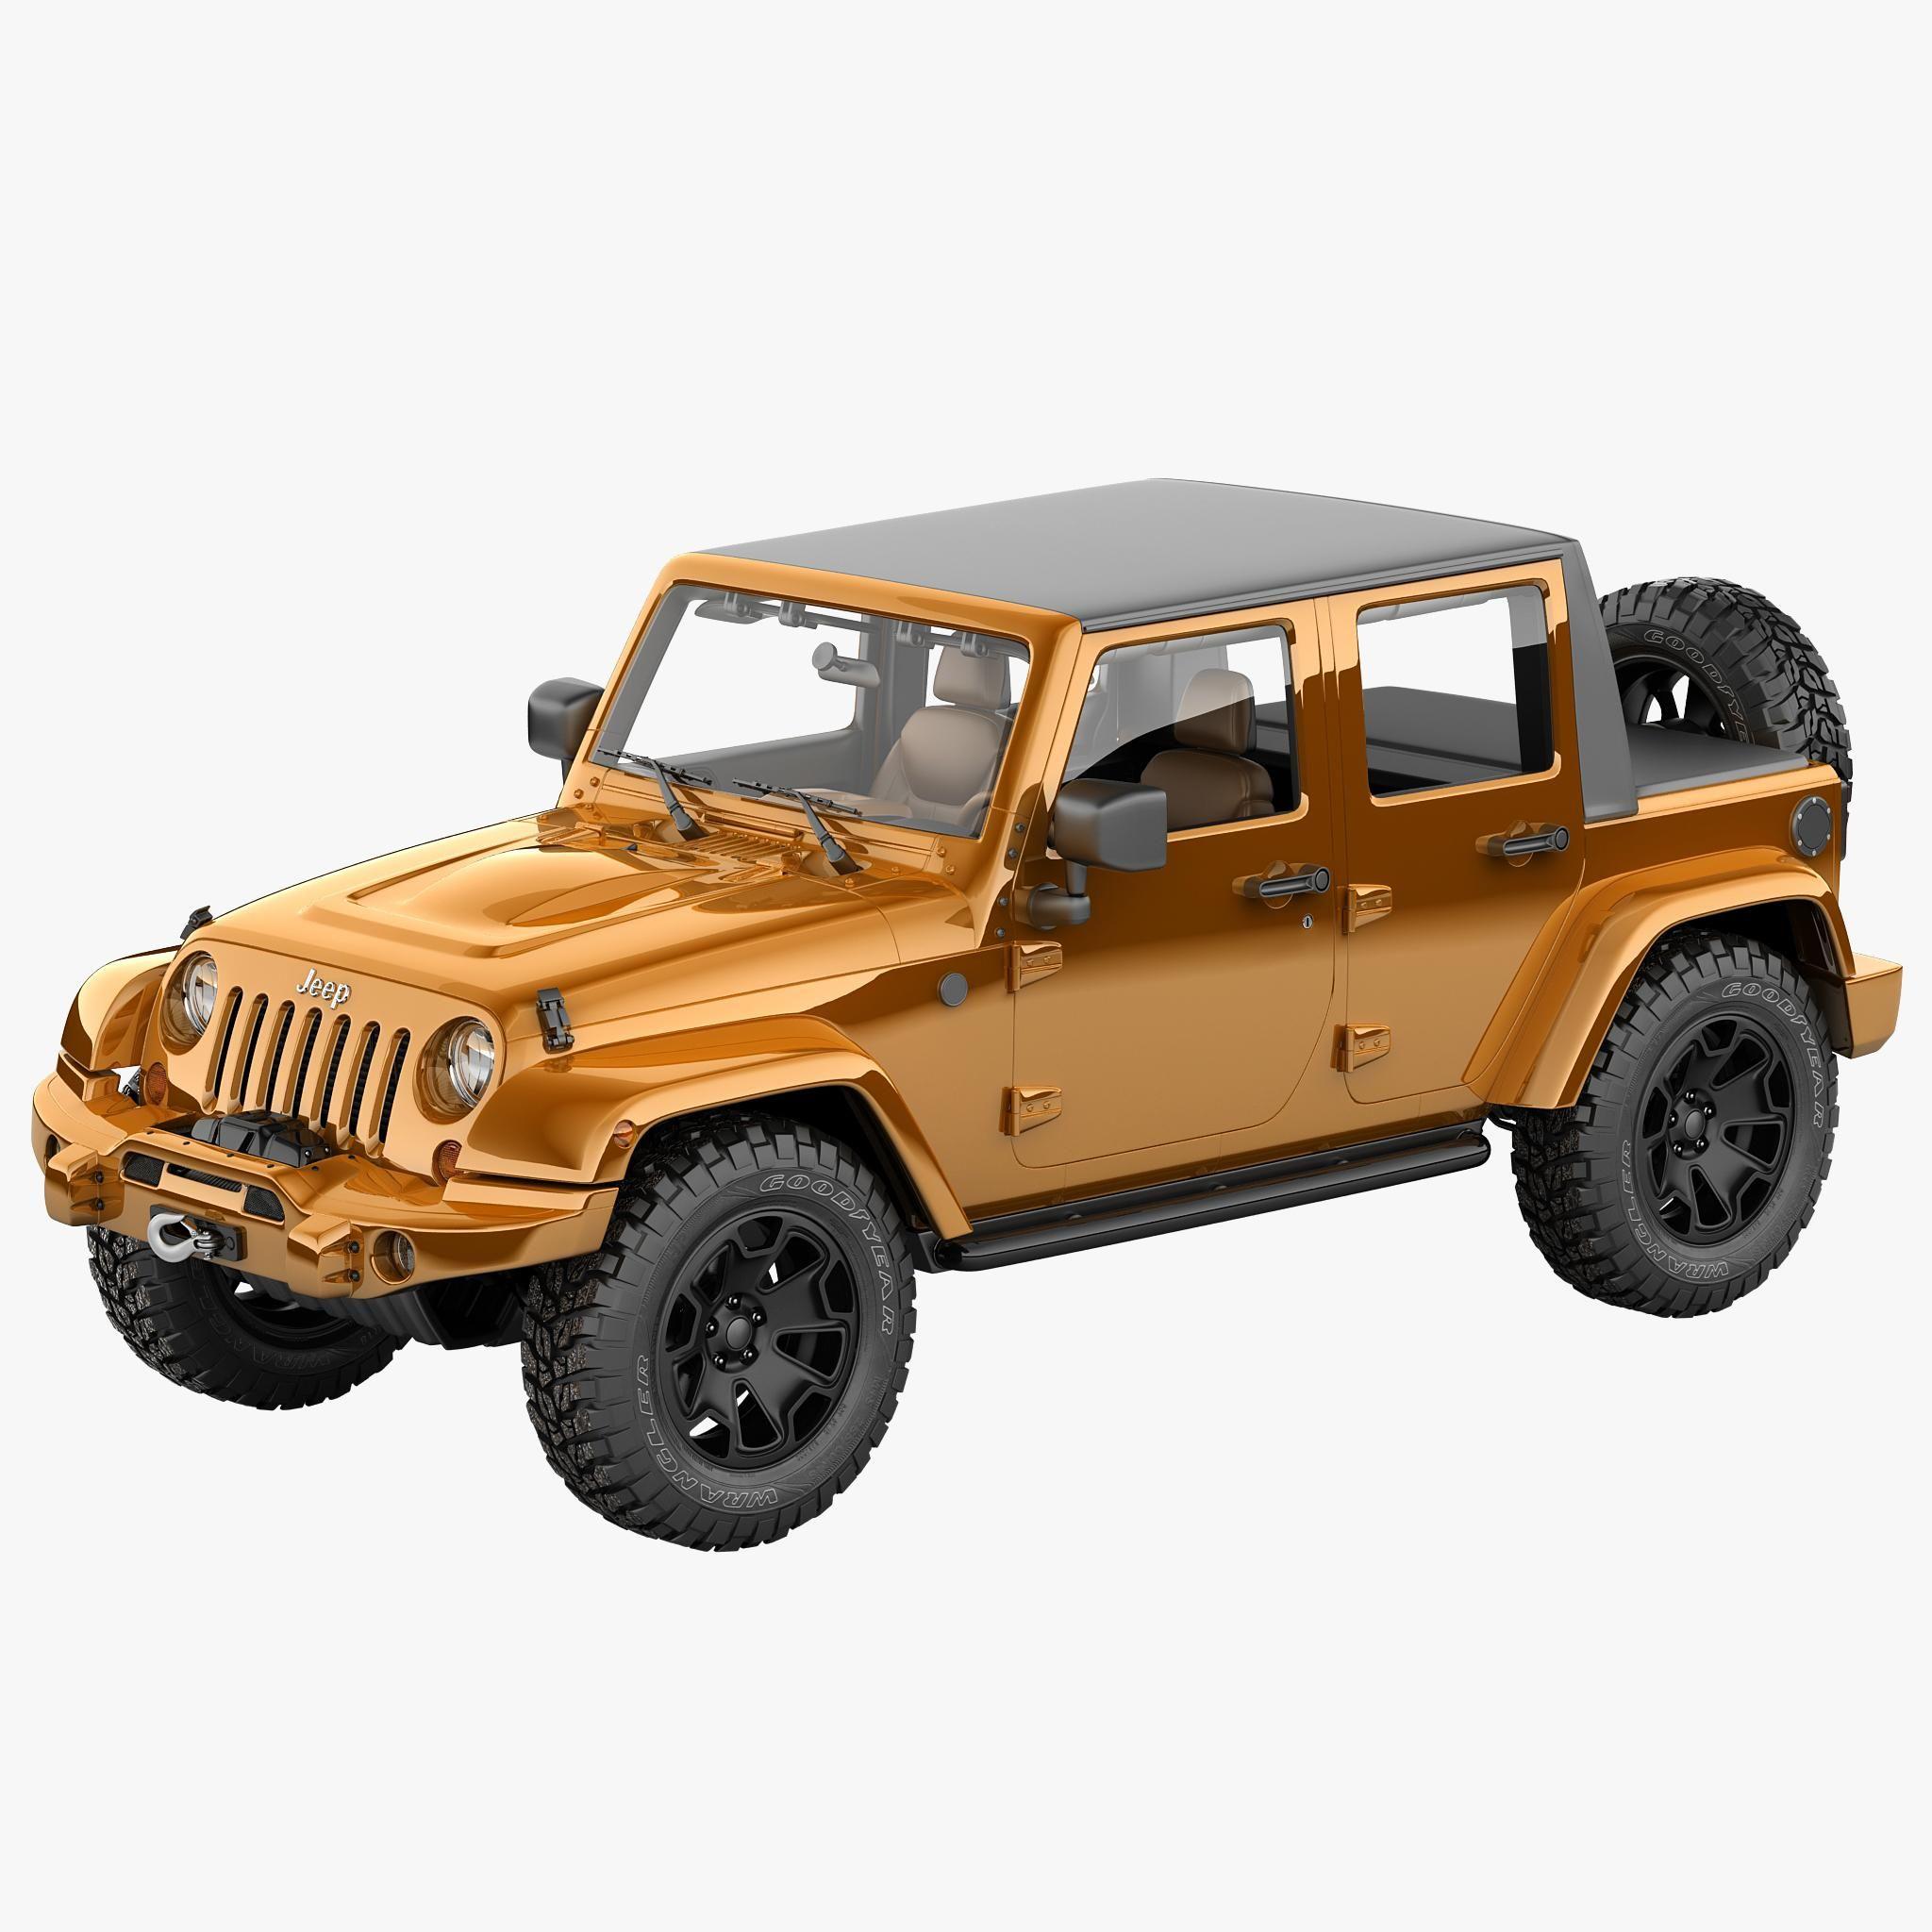 Jeep Wrangler Moab Half Pickup 3d Model Ad Wrangler Jeep Moab Model Jeep Wrangler Jeep Jeep Models